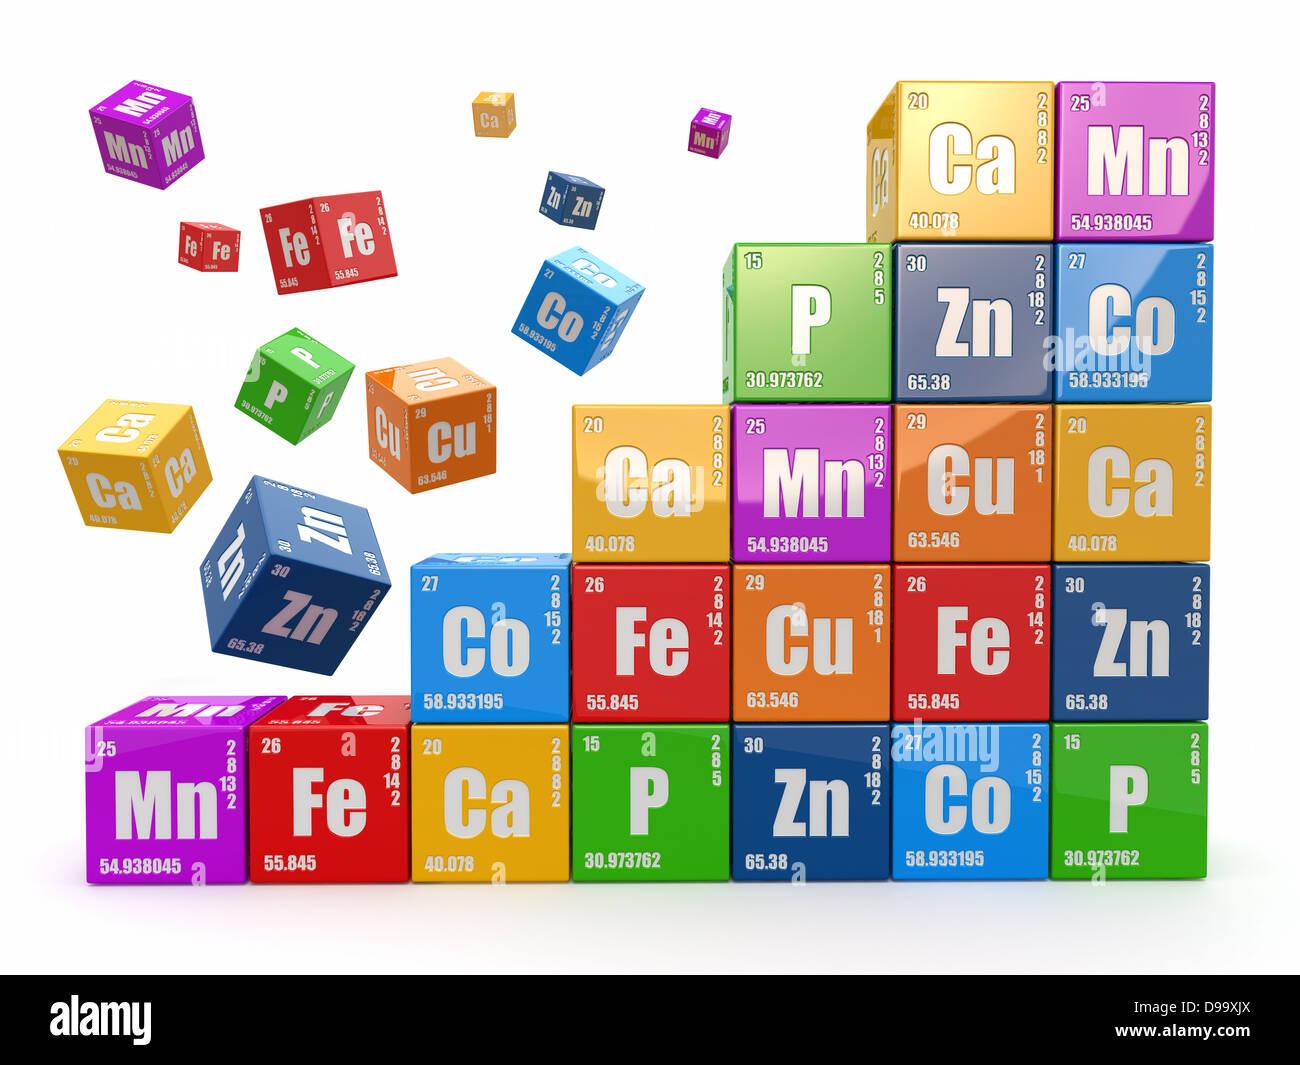 Concepto de qumica muro de cubos wiyh tabla peridica de elementos concepto de qumica muro de cubos wiyh tabla peridica de elementos 3d urtaz Gallery